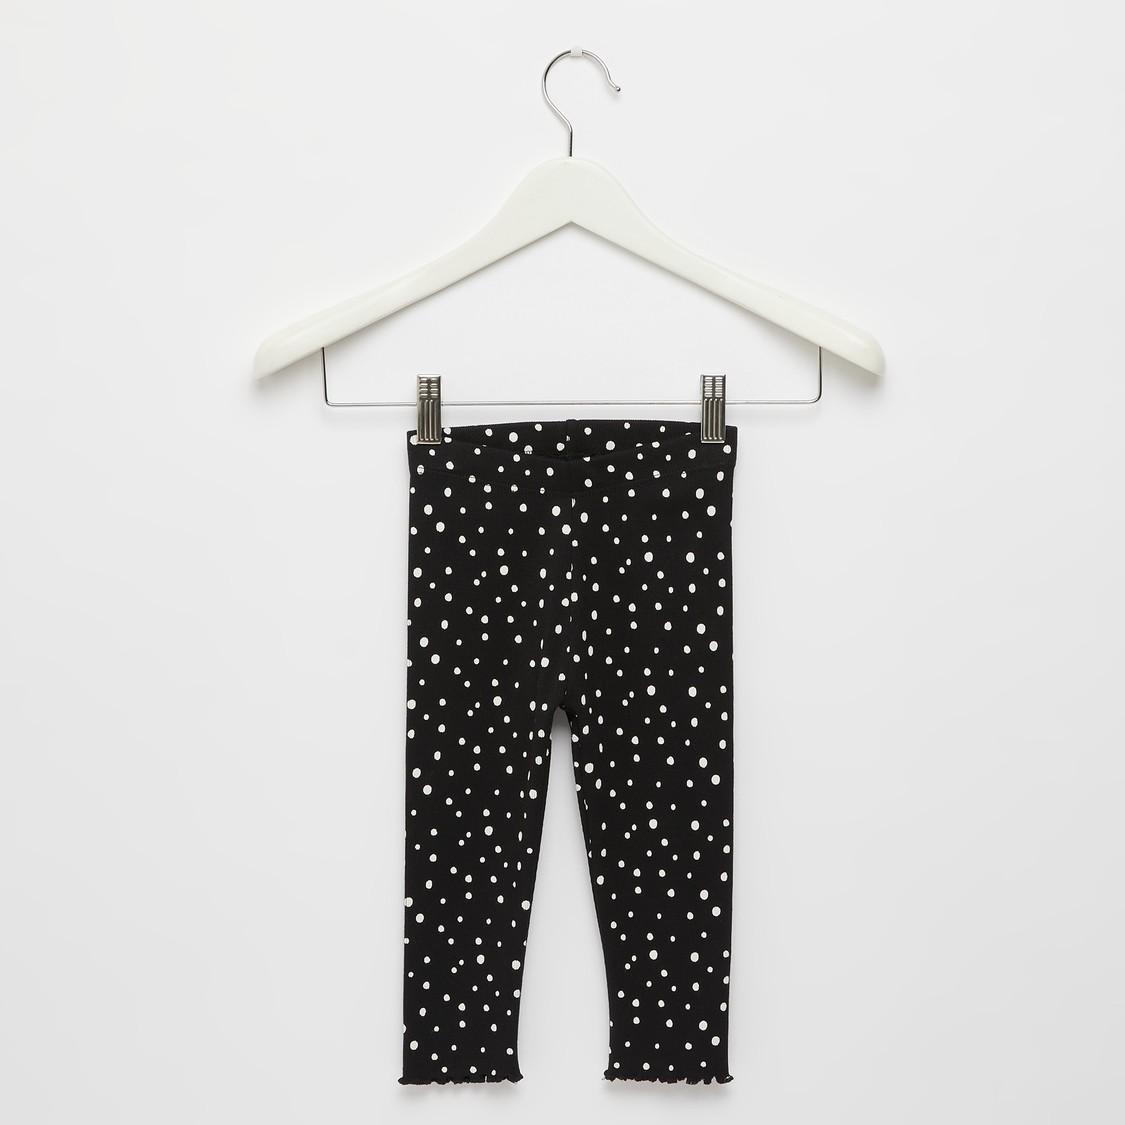 Polka Dots Print Ribbed Leggings with Elasticised Waistband